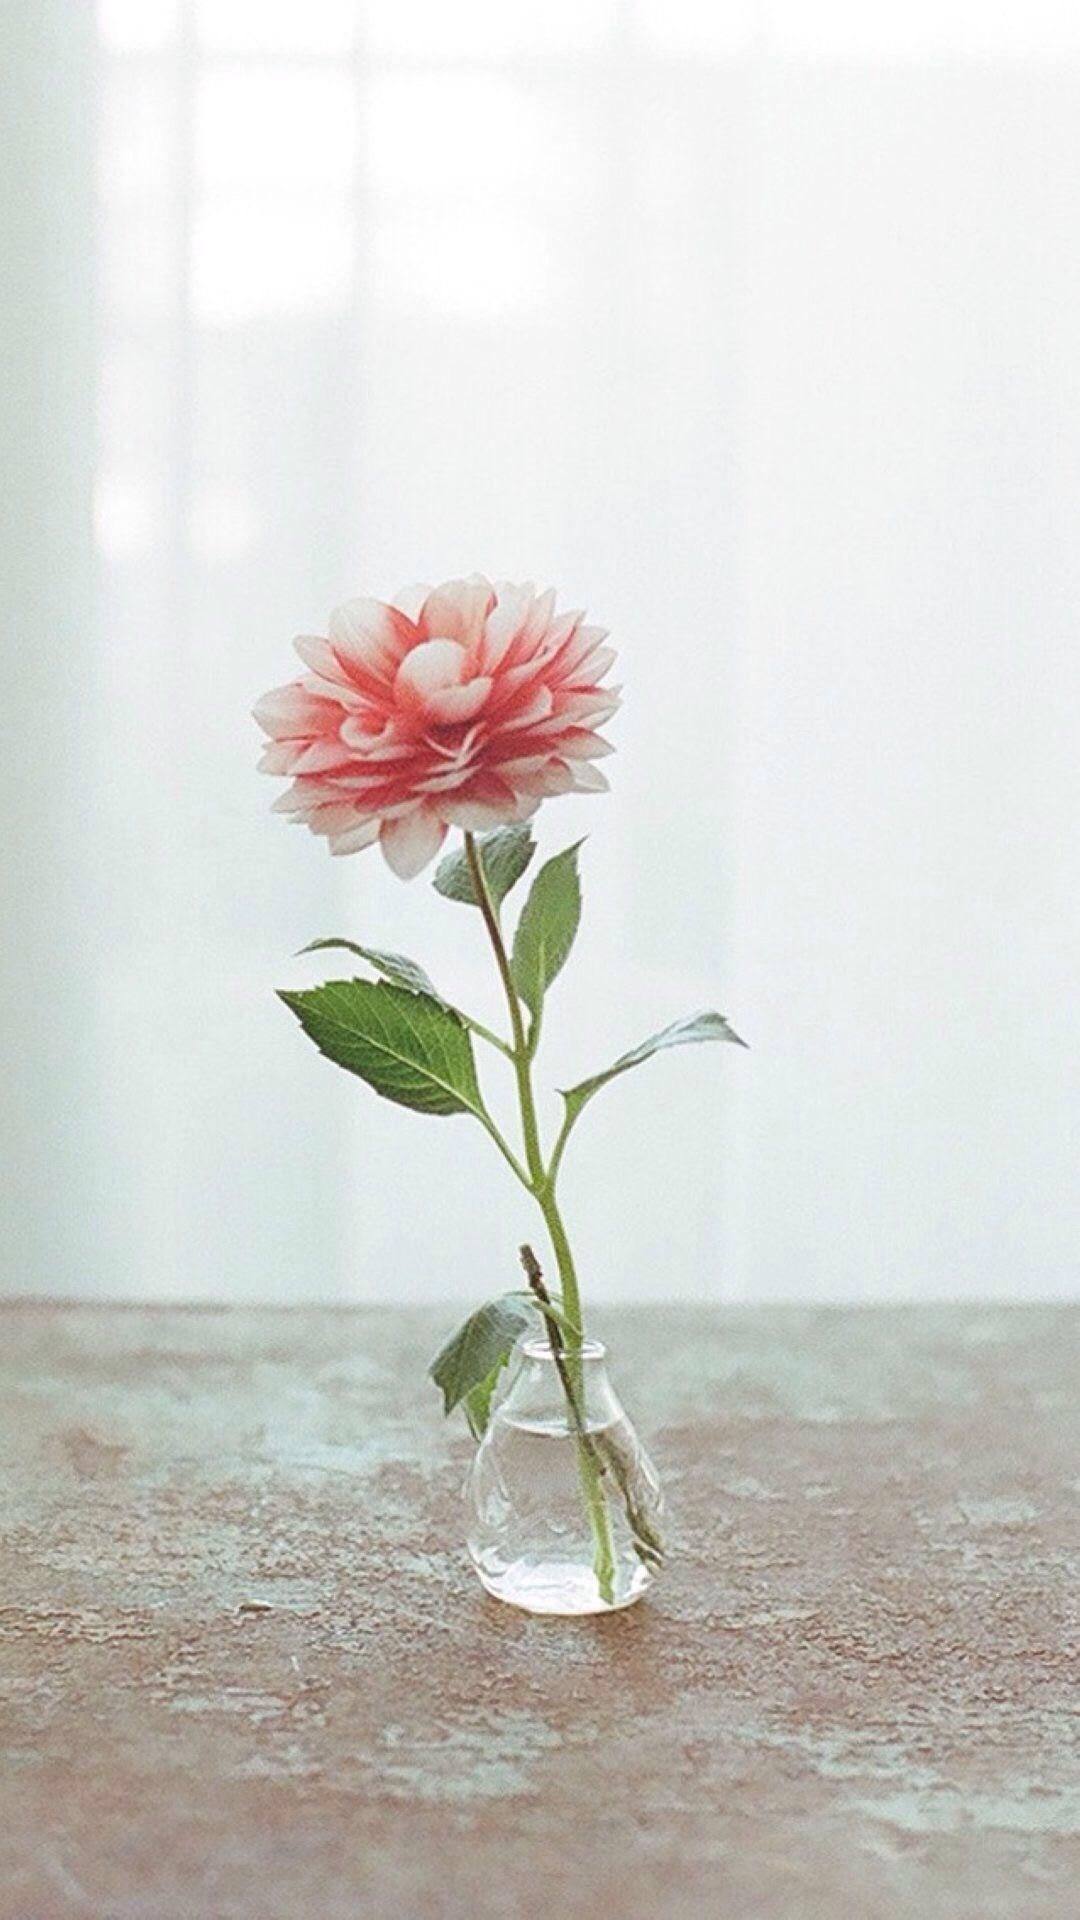 Res: 1080x1920, Natur pur eleganten Blumenvase drinnen Gardinen Dekorationen iPhone 8 Plus  Wallpaper